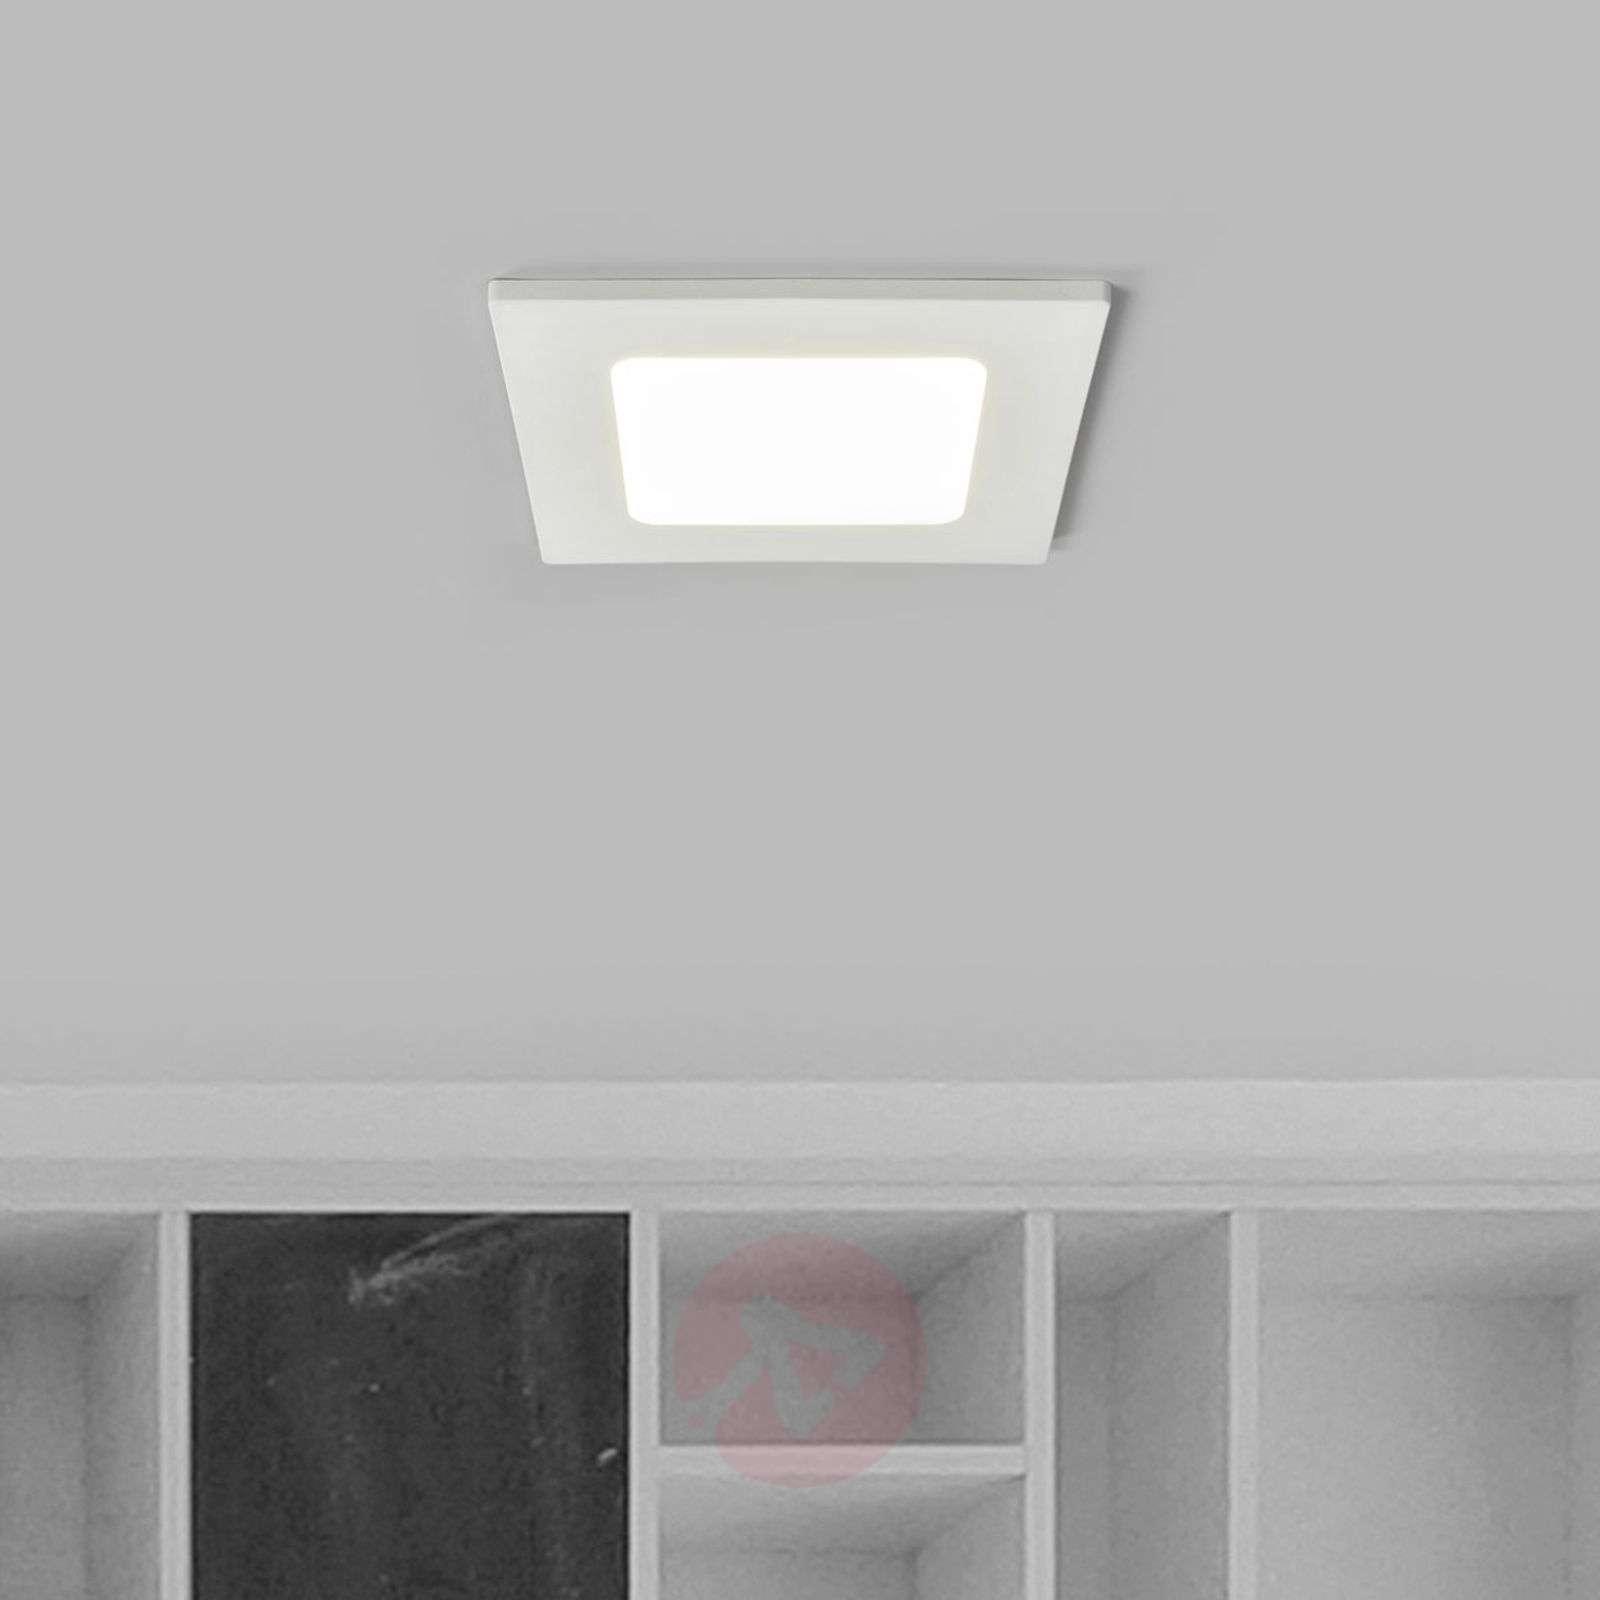 Joki LED downlight white 4000K angular 11.5cm-9978060-02